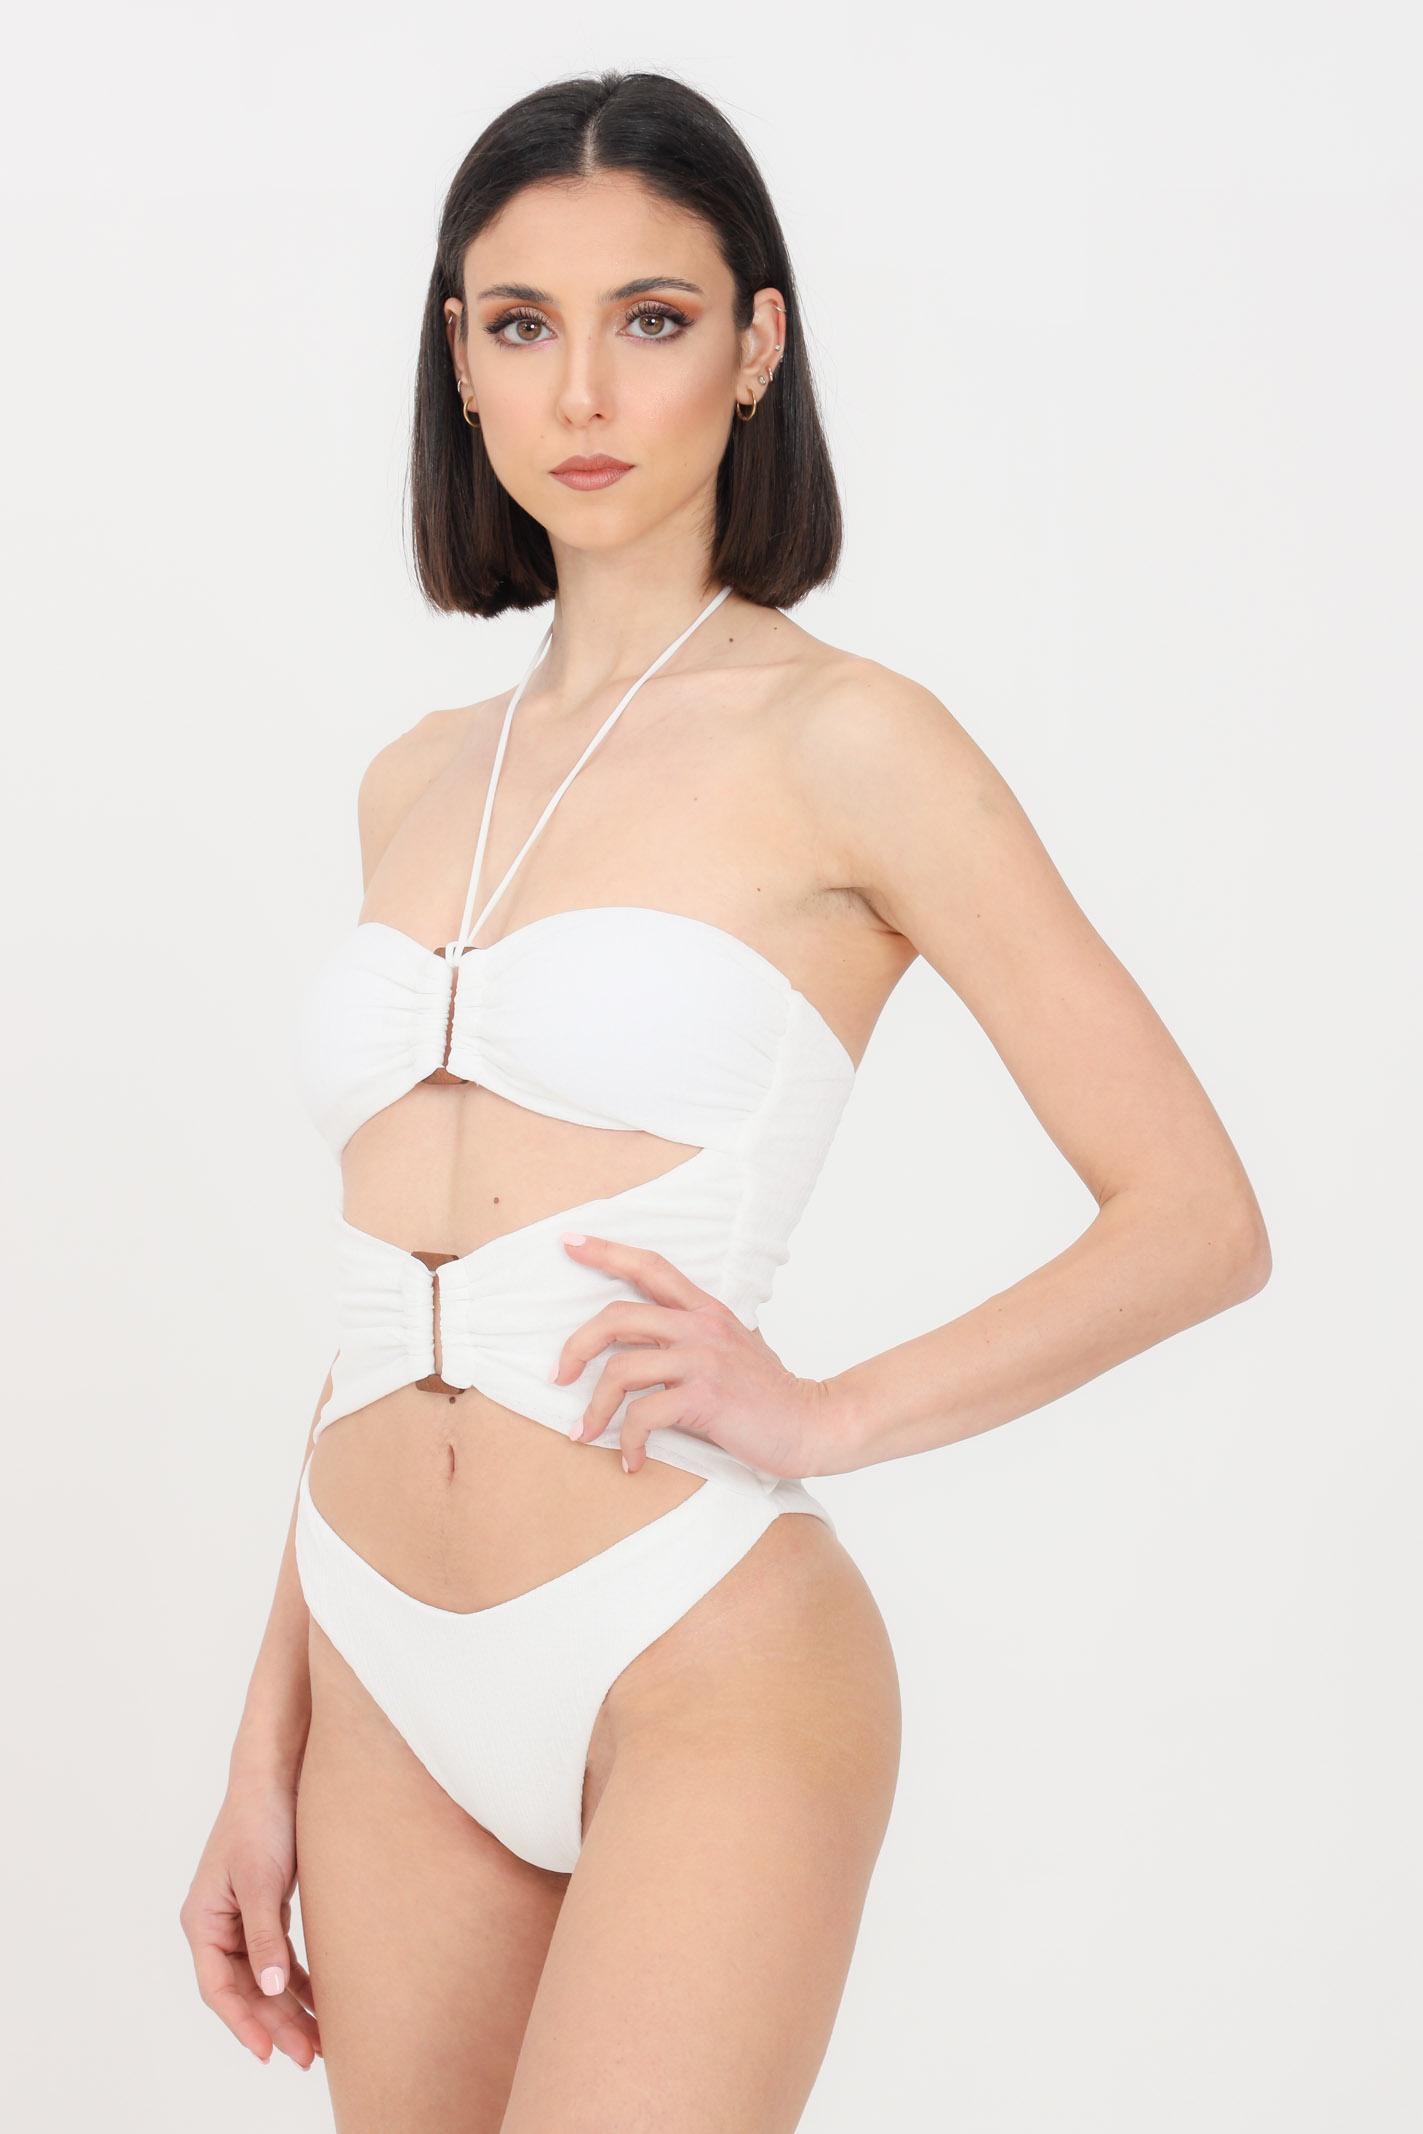 Image of Costume intero donna bianco f**k monokini roam